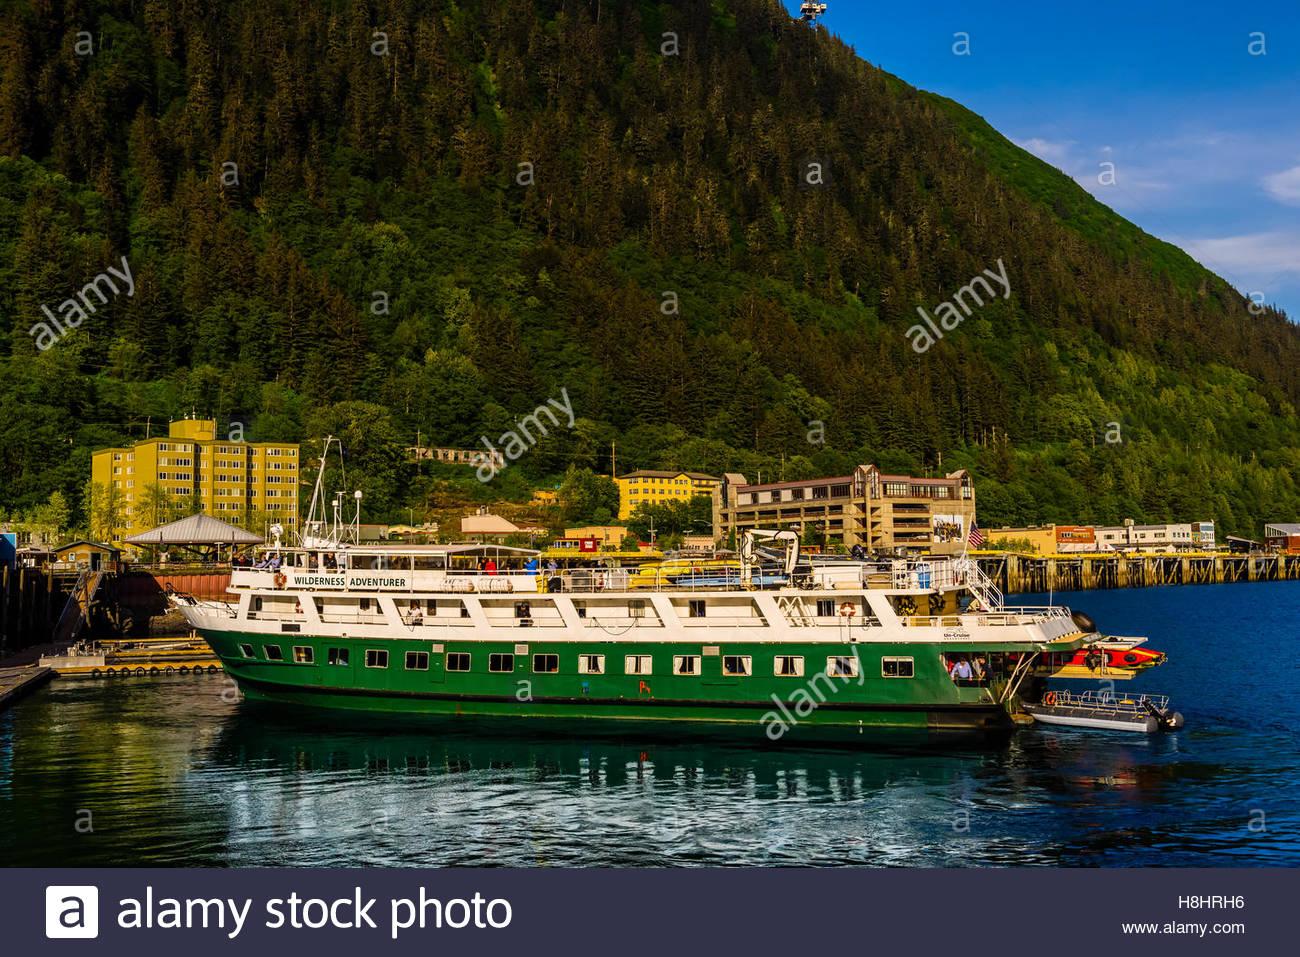 Un-Cruise 'Wilderness Adventurer' docked in Juneau, Alaska USA. - Stock Image